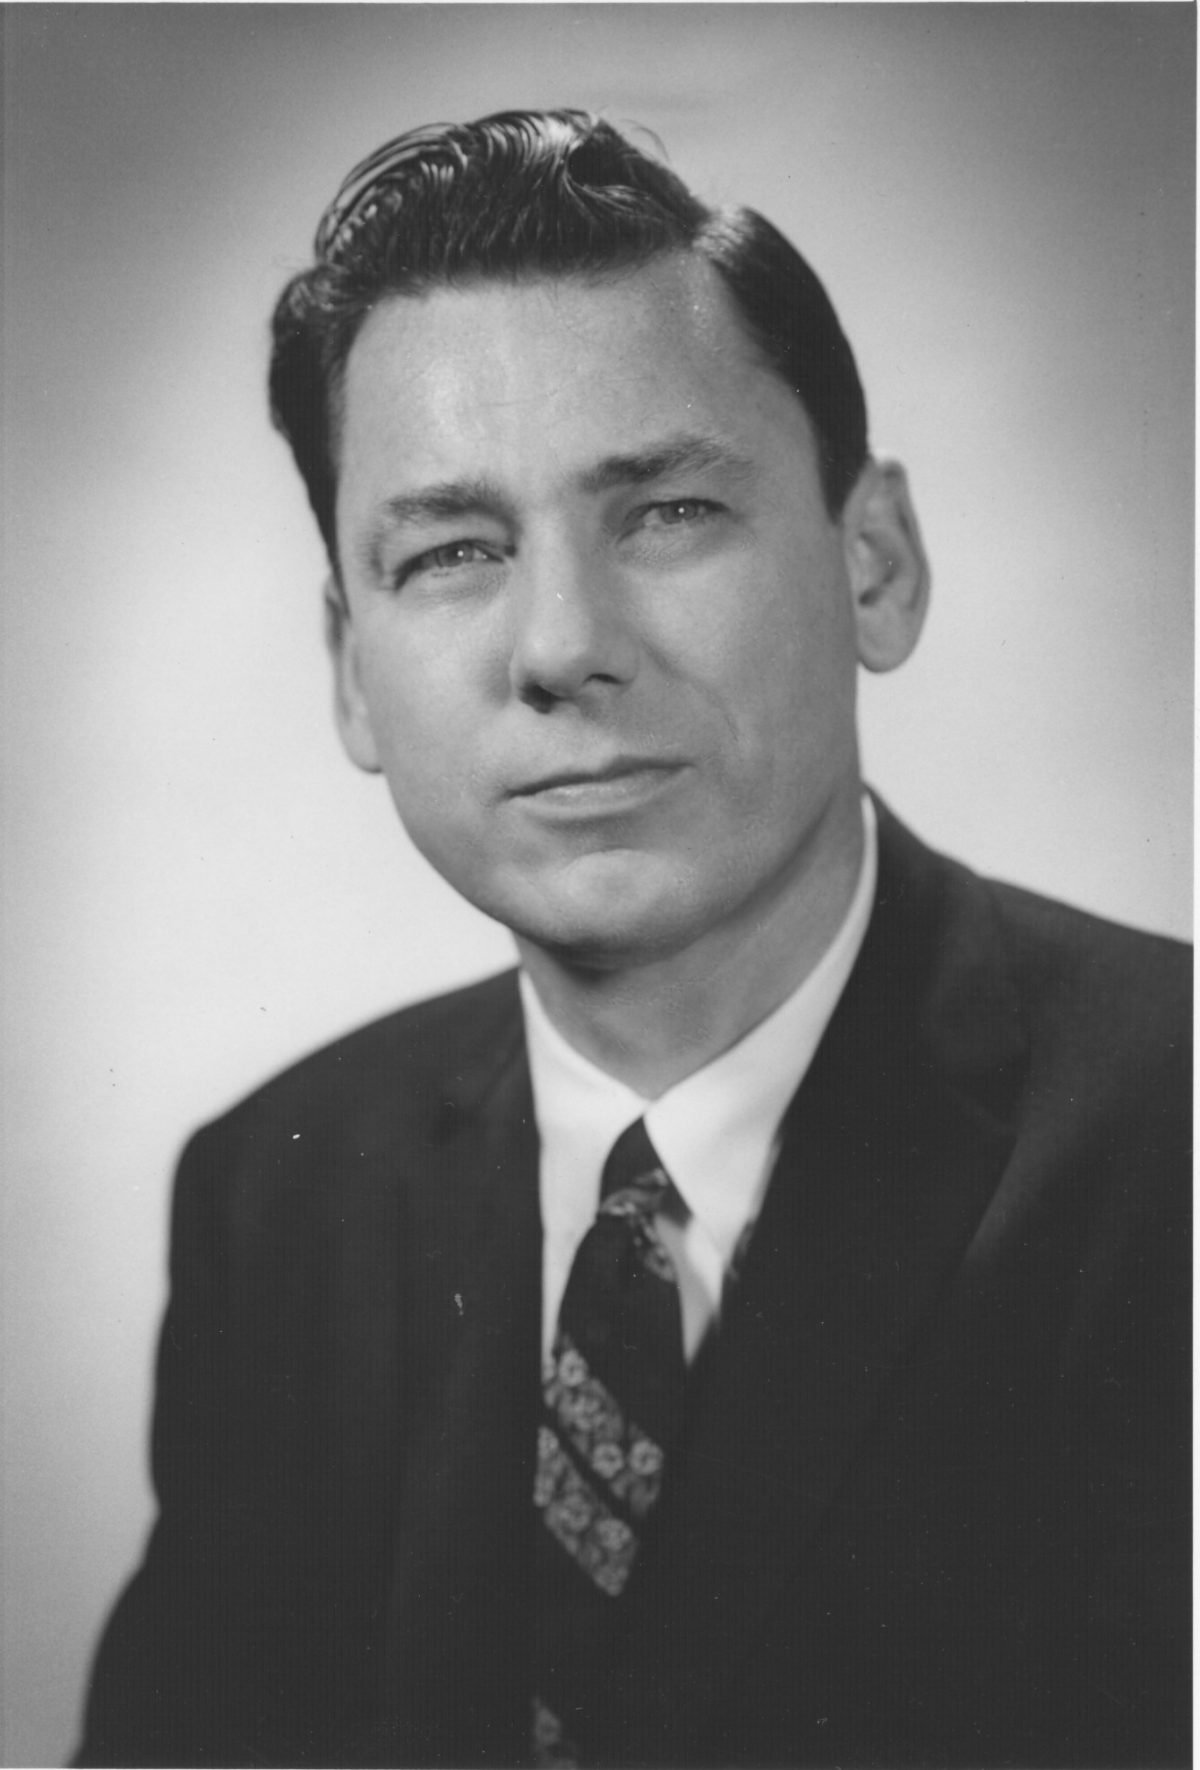 John R. Everett